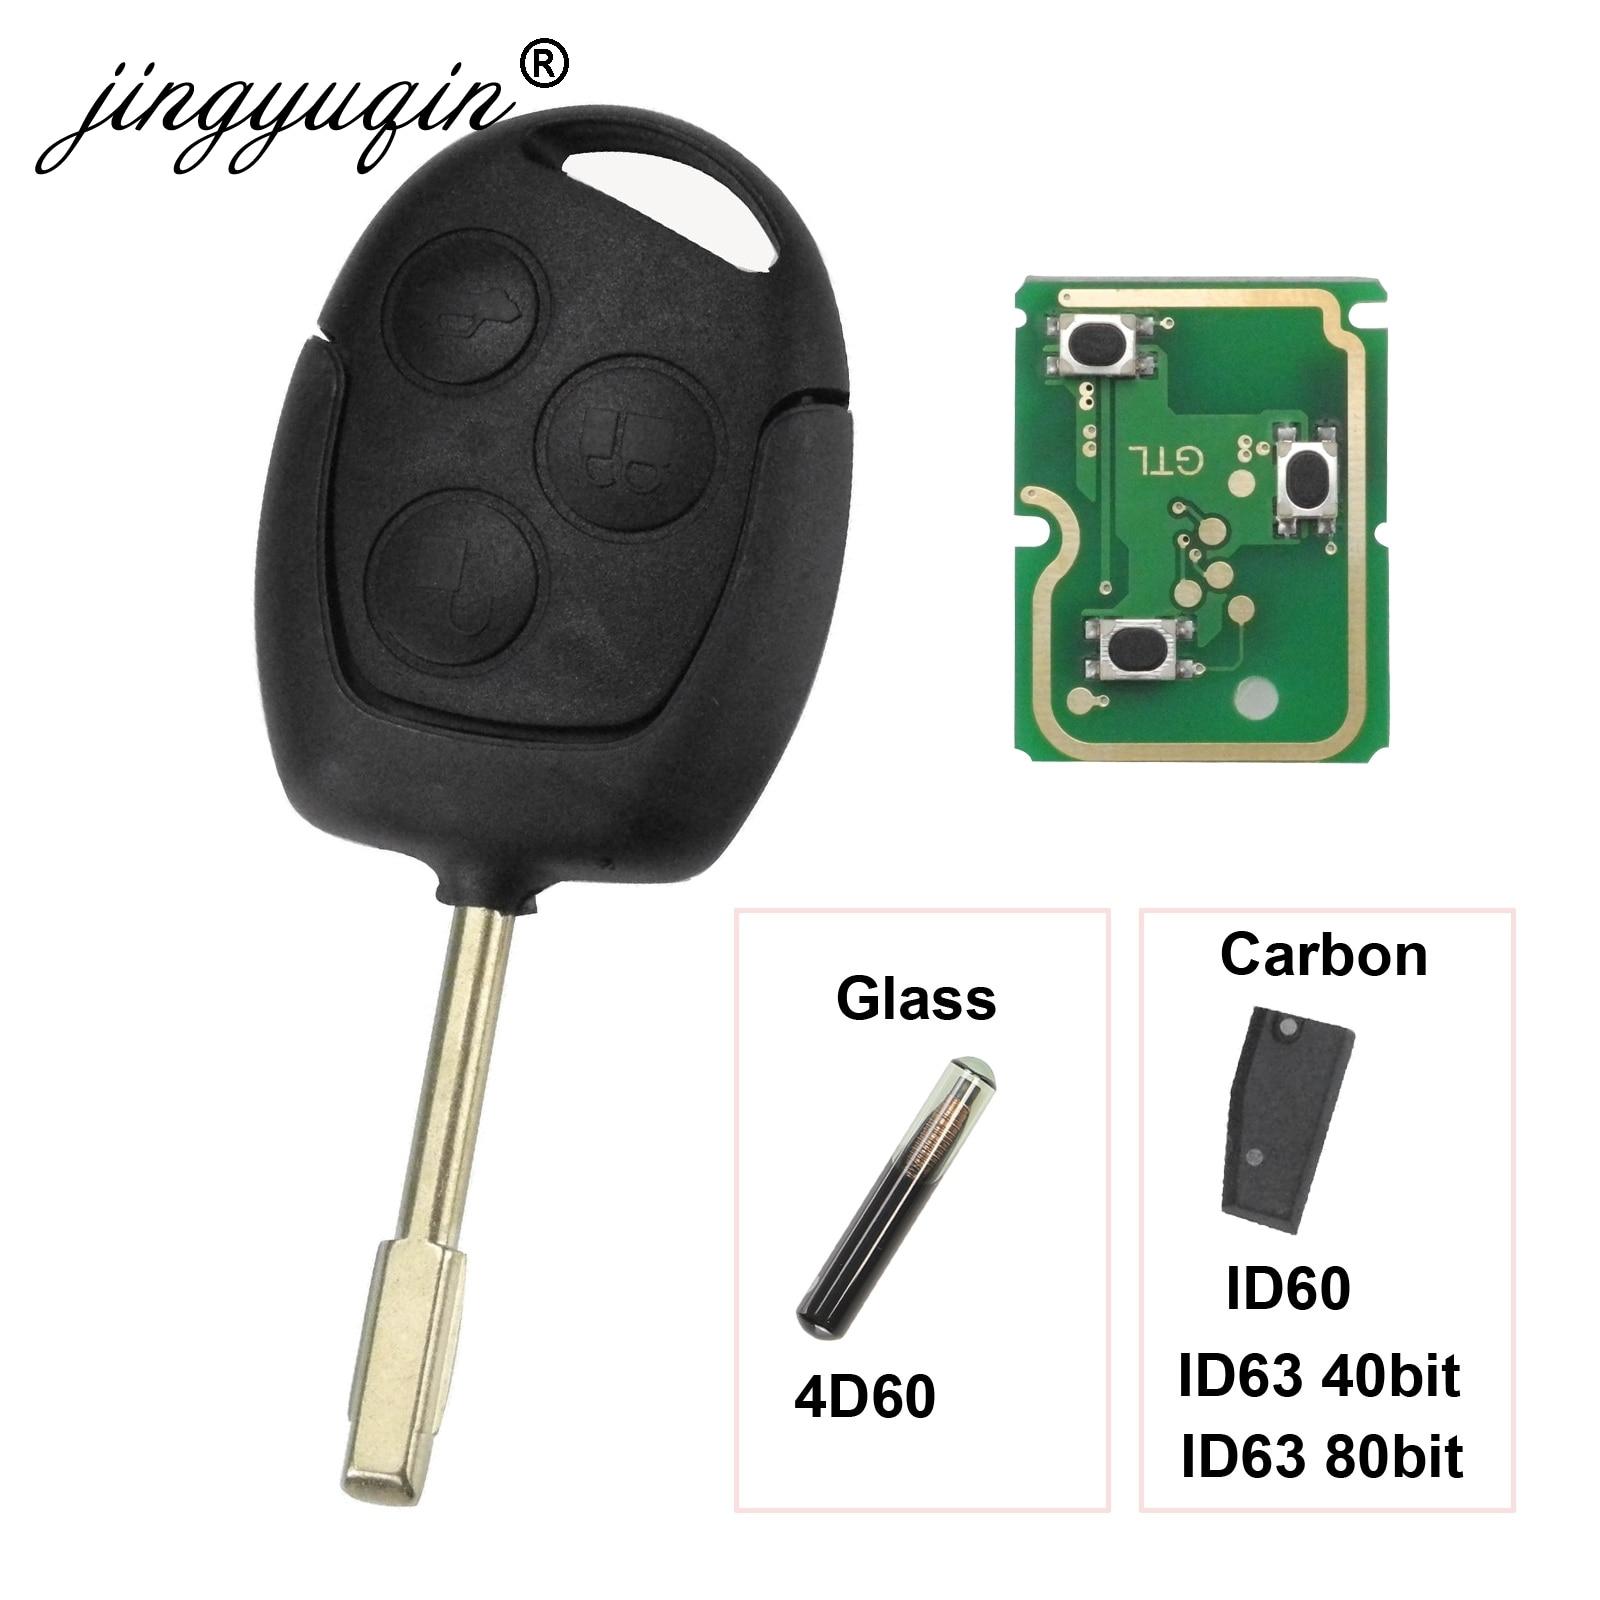 Jingyuqin 3 кнопки дистанционного ключа Fob 315 МГц 433 МГц 4D60 ID63 чип для Ford Mondeo Focus Fusion Fiesta Galaxy Transit Полный Автомобильный ключ